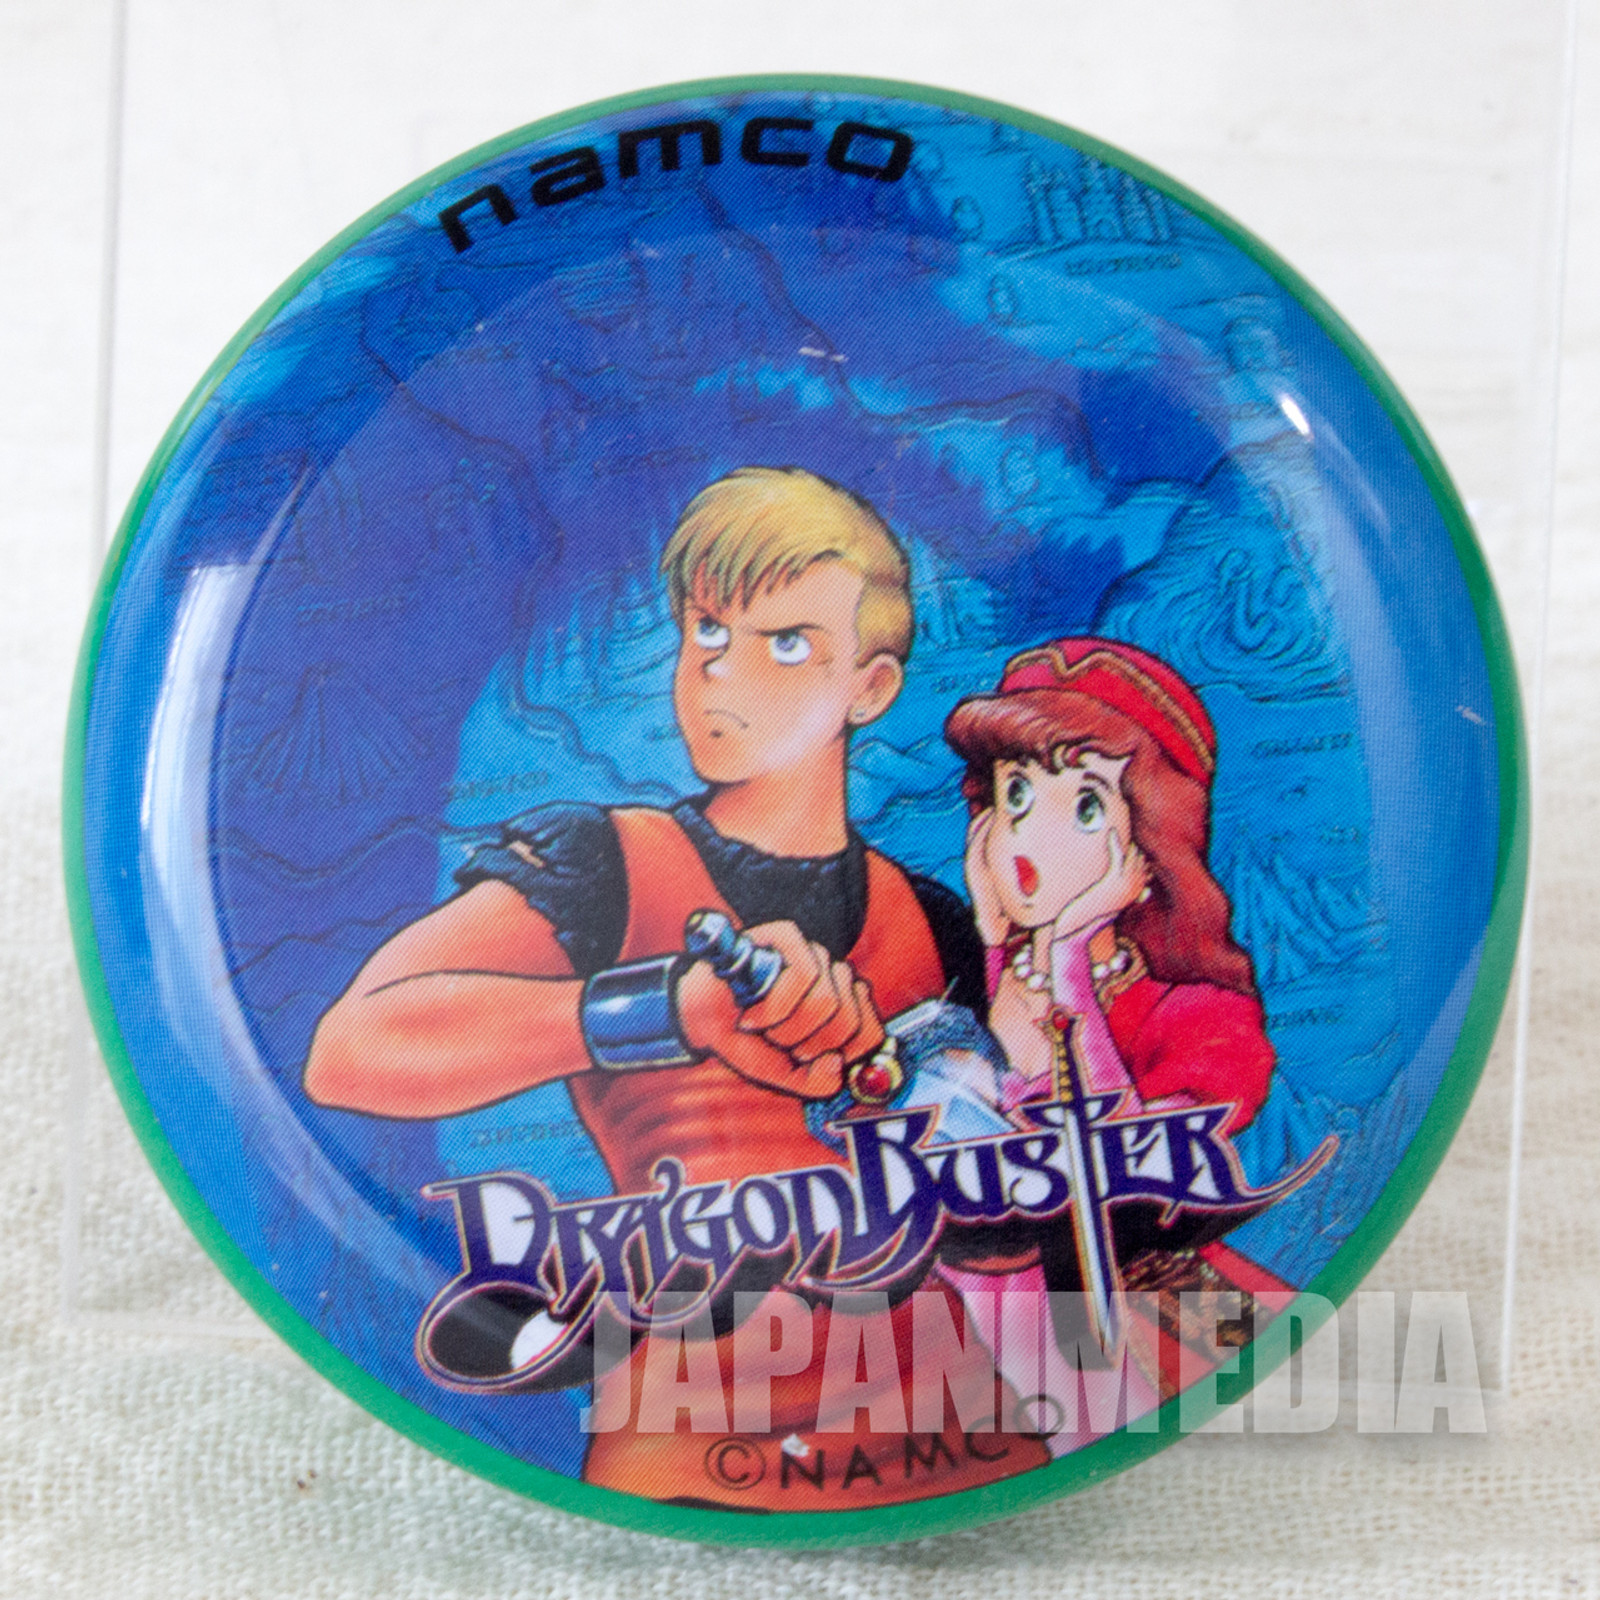 Retro RARE Dragon Buster Yoyo Toy Namco JAPAN FAMICOM NINTNEDO